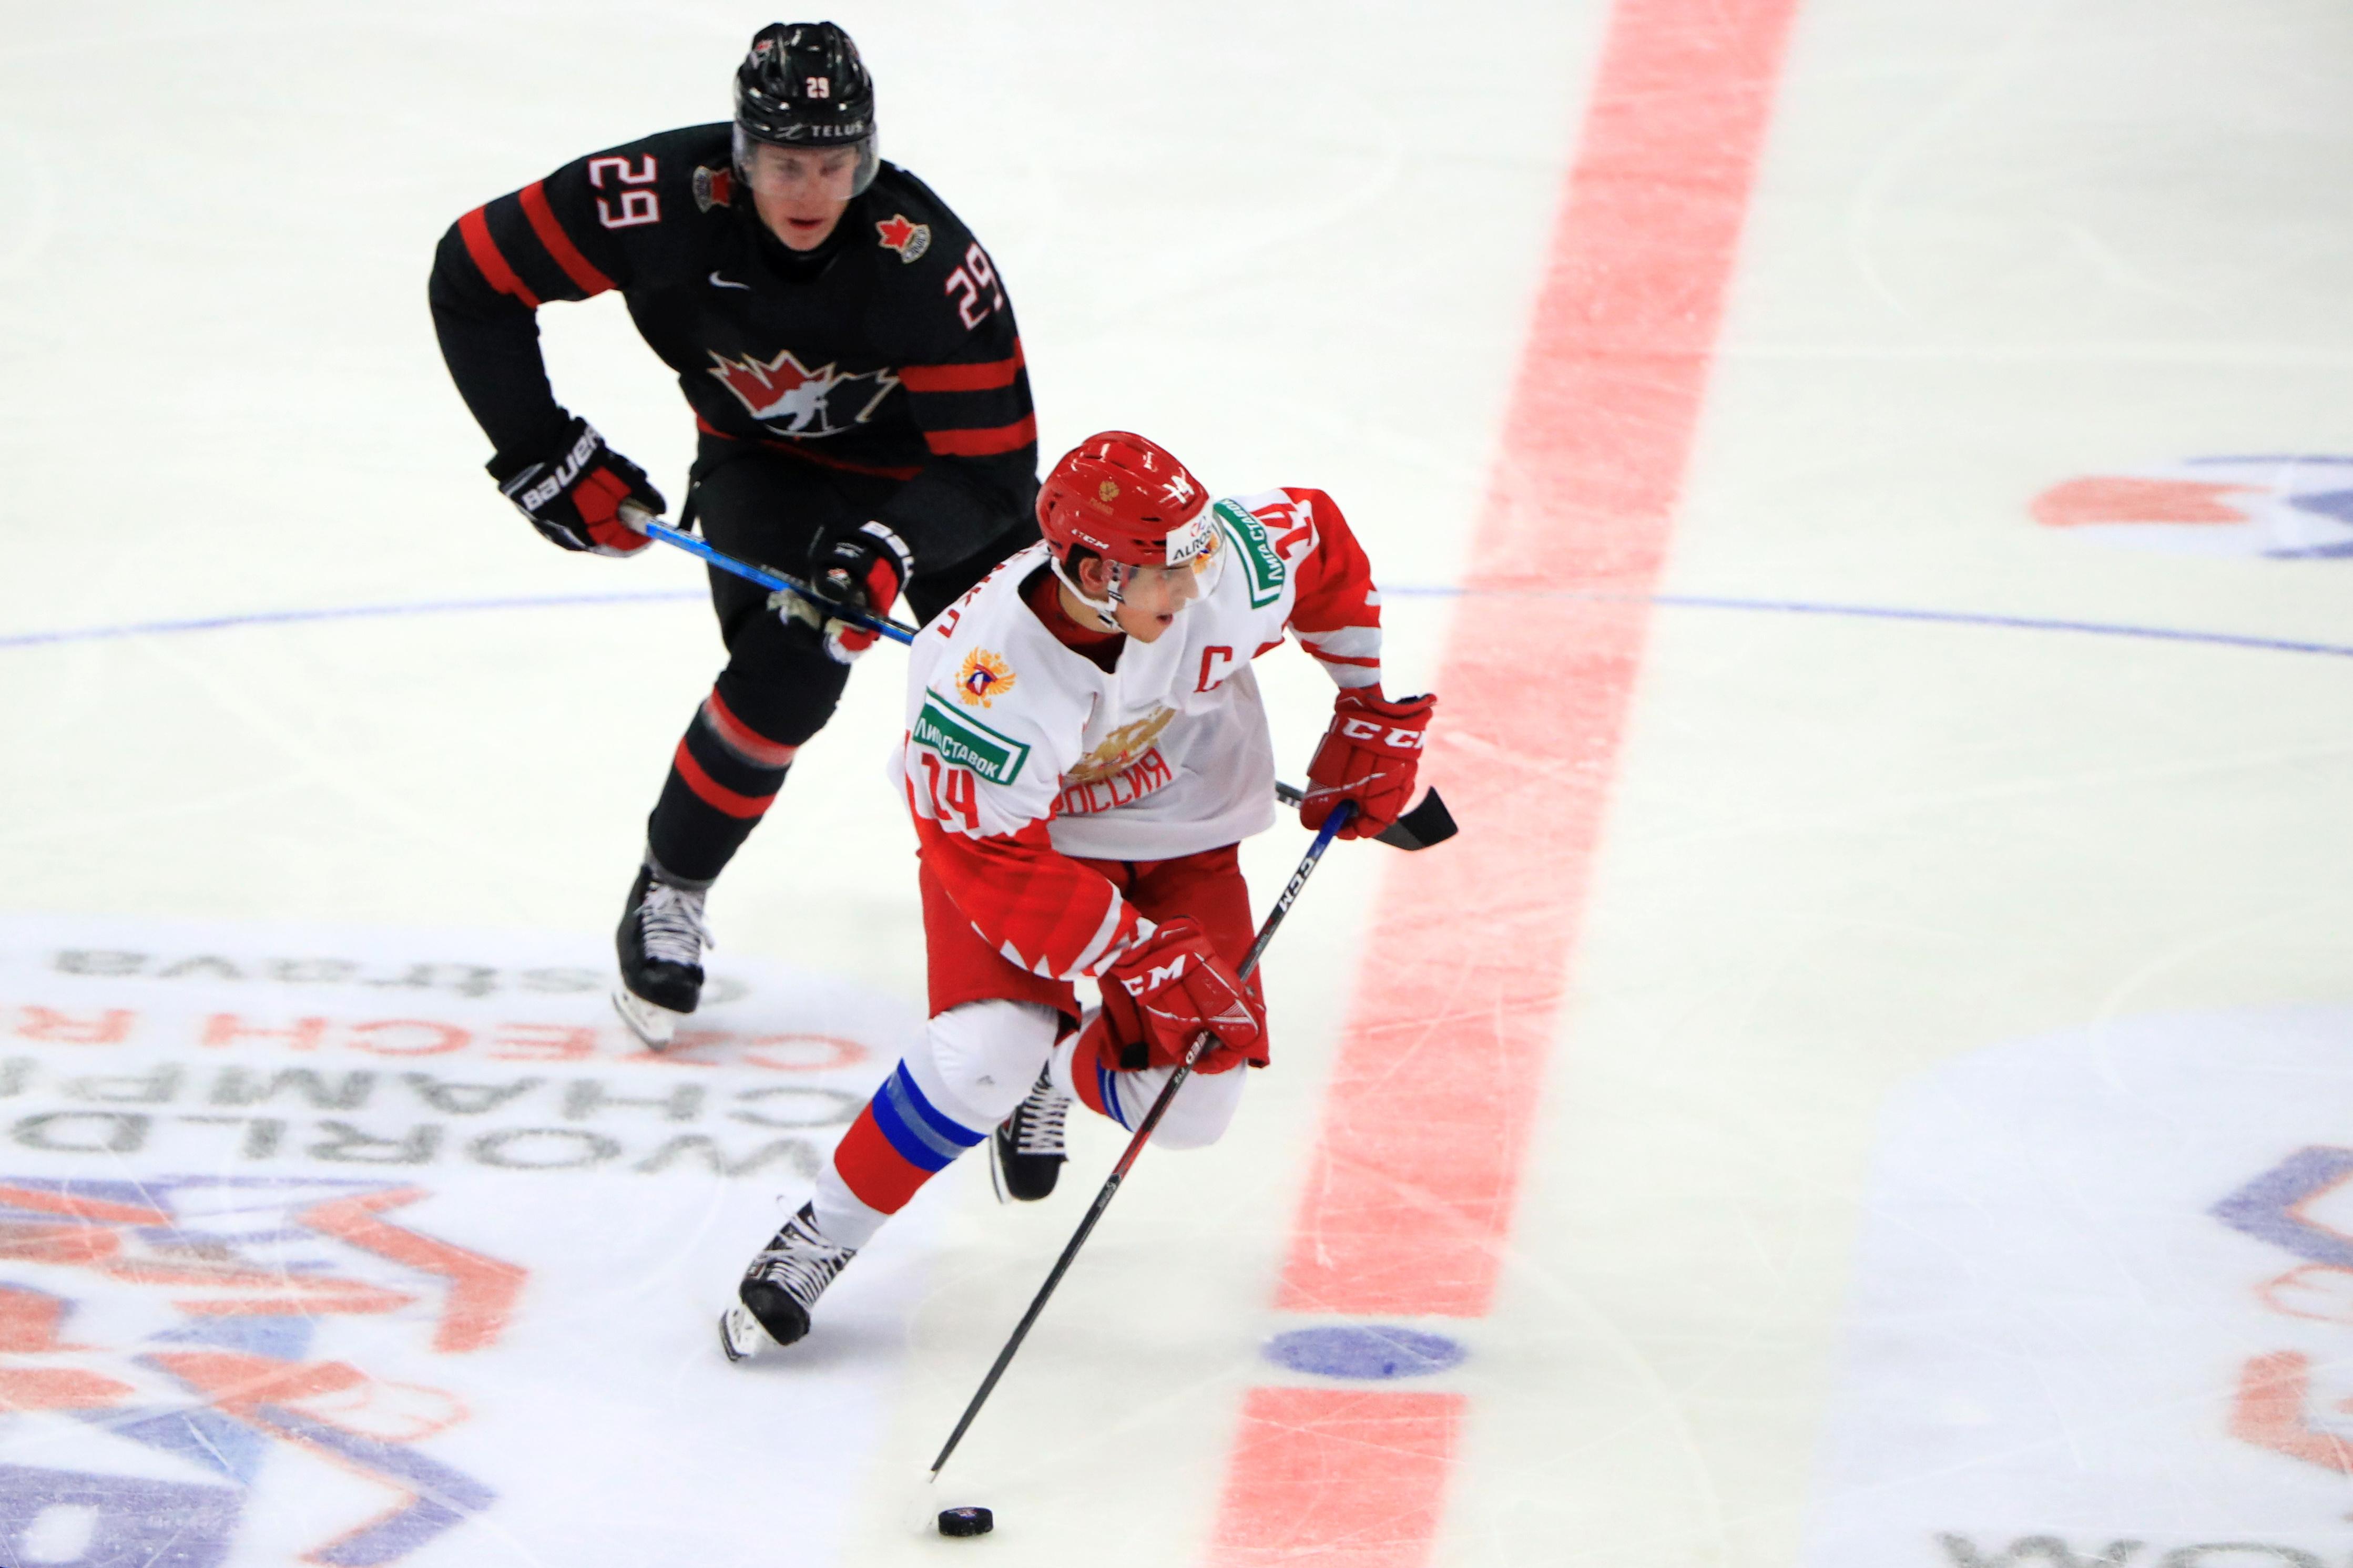 2020 World Junior Ice Hockey Championship, final: Canada vs Russia